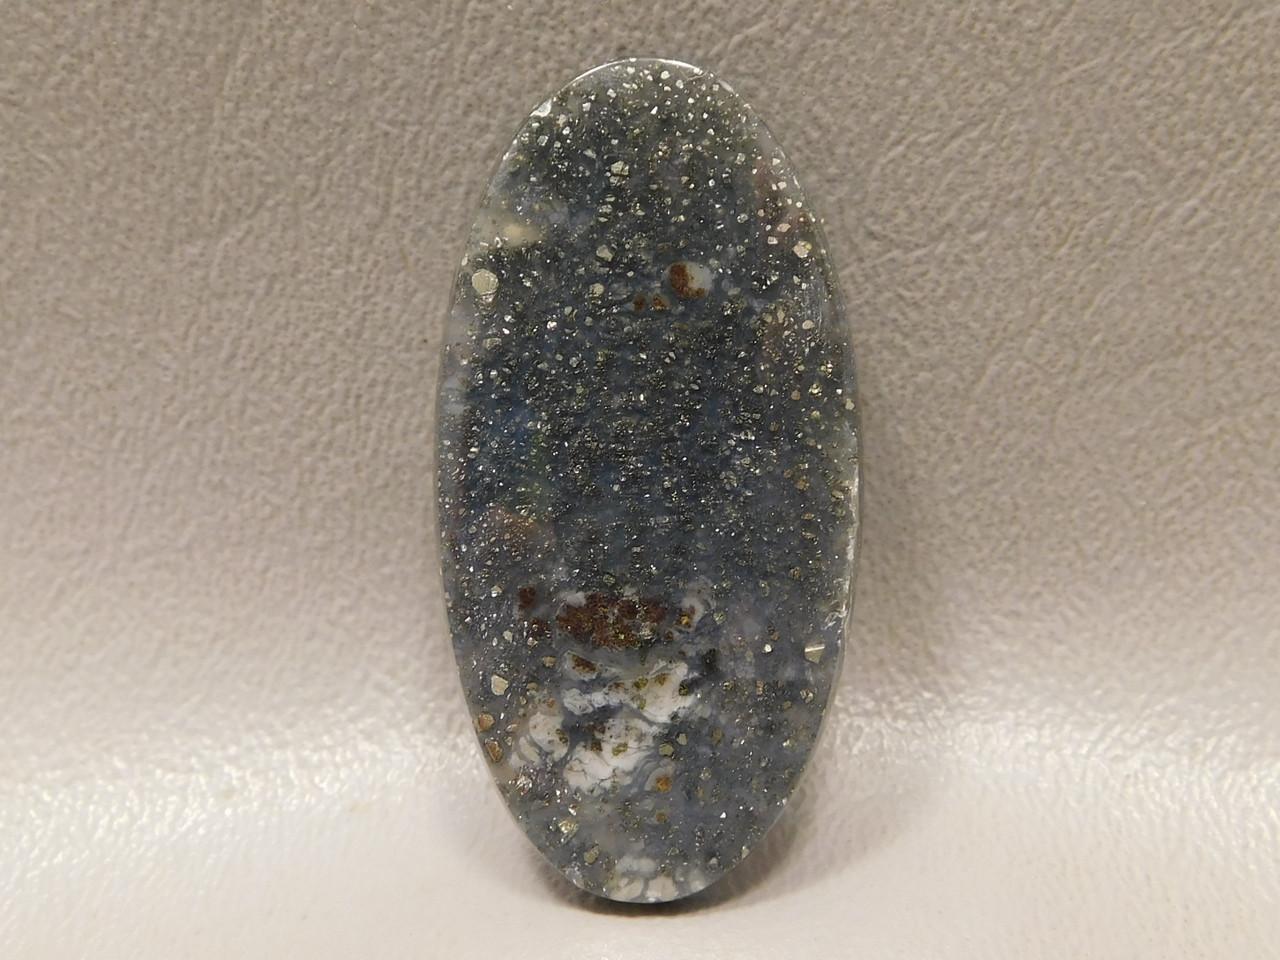 Pyrite Agate Cabochon Rare Lapidary Stone for Jewelry Design #11